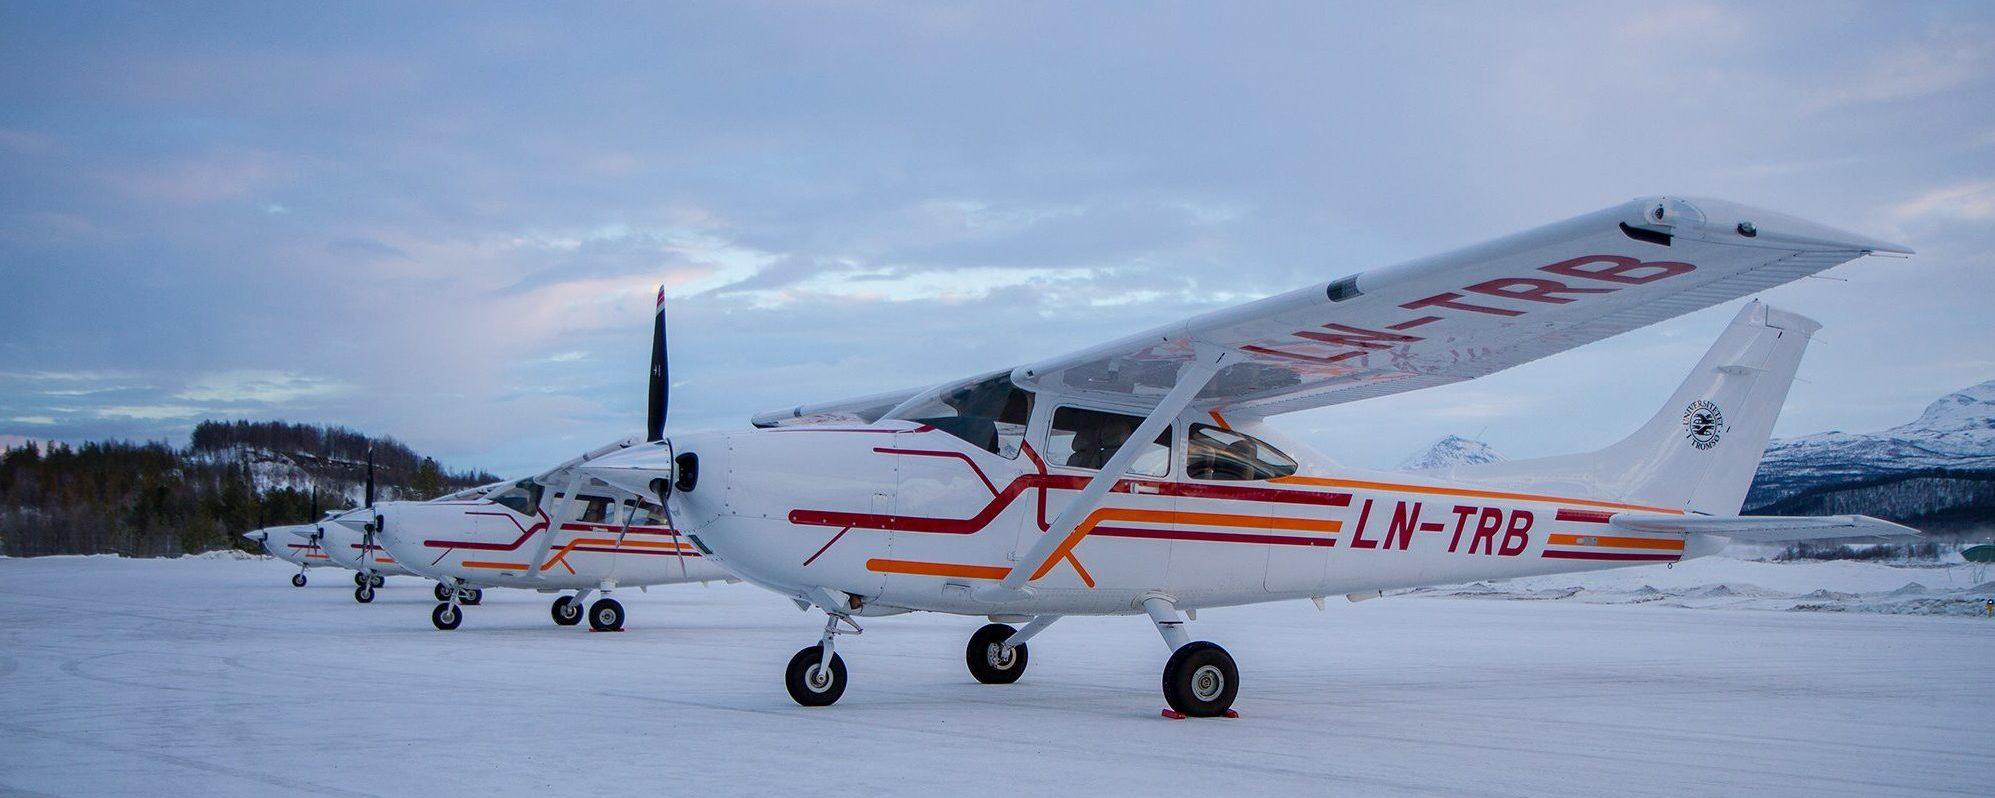 University of Tromsø School of Aviation